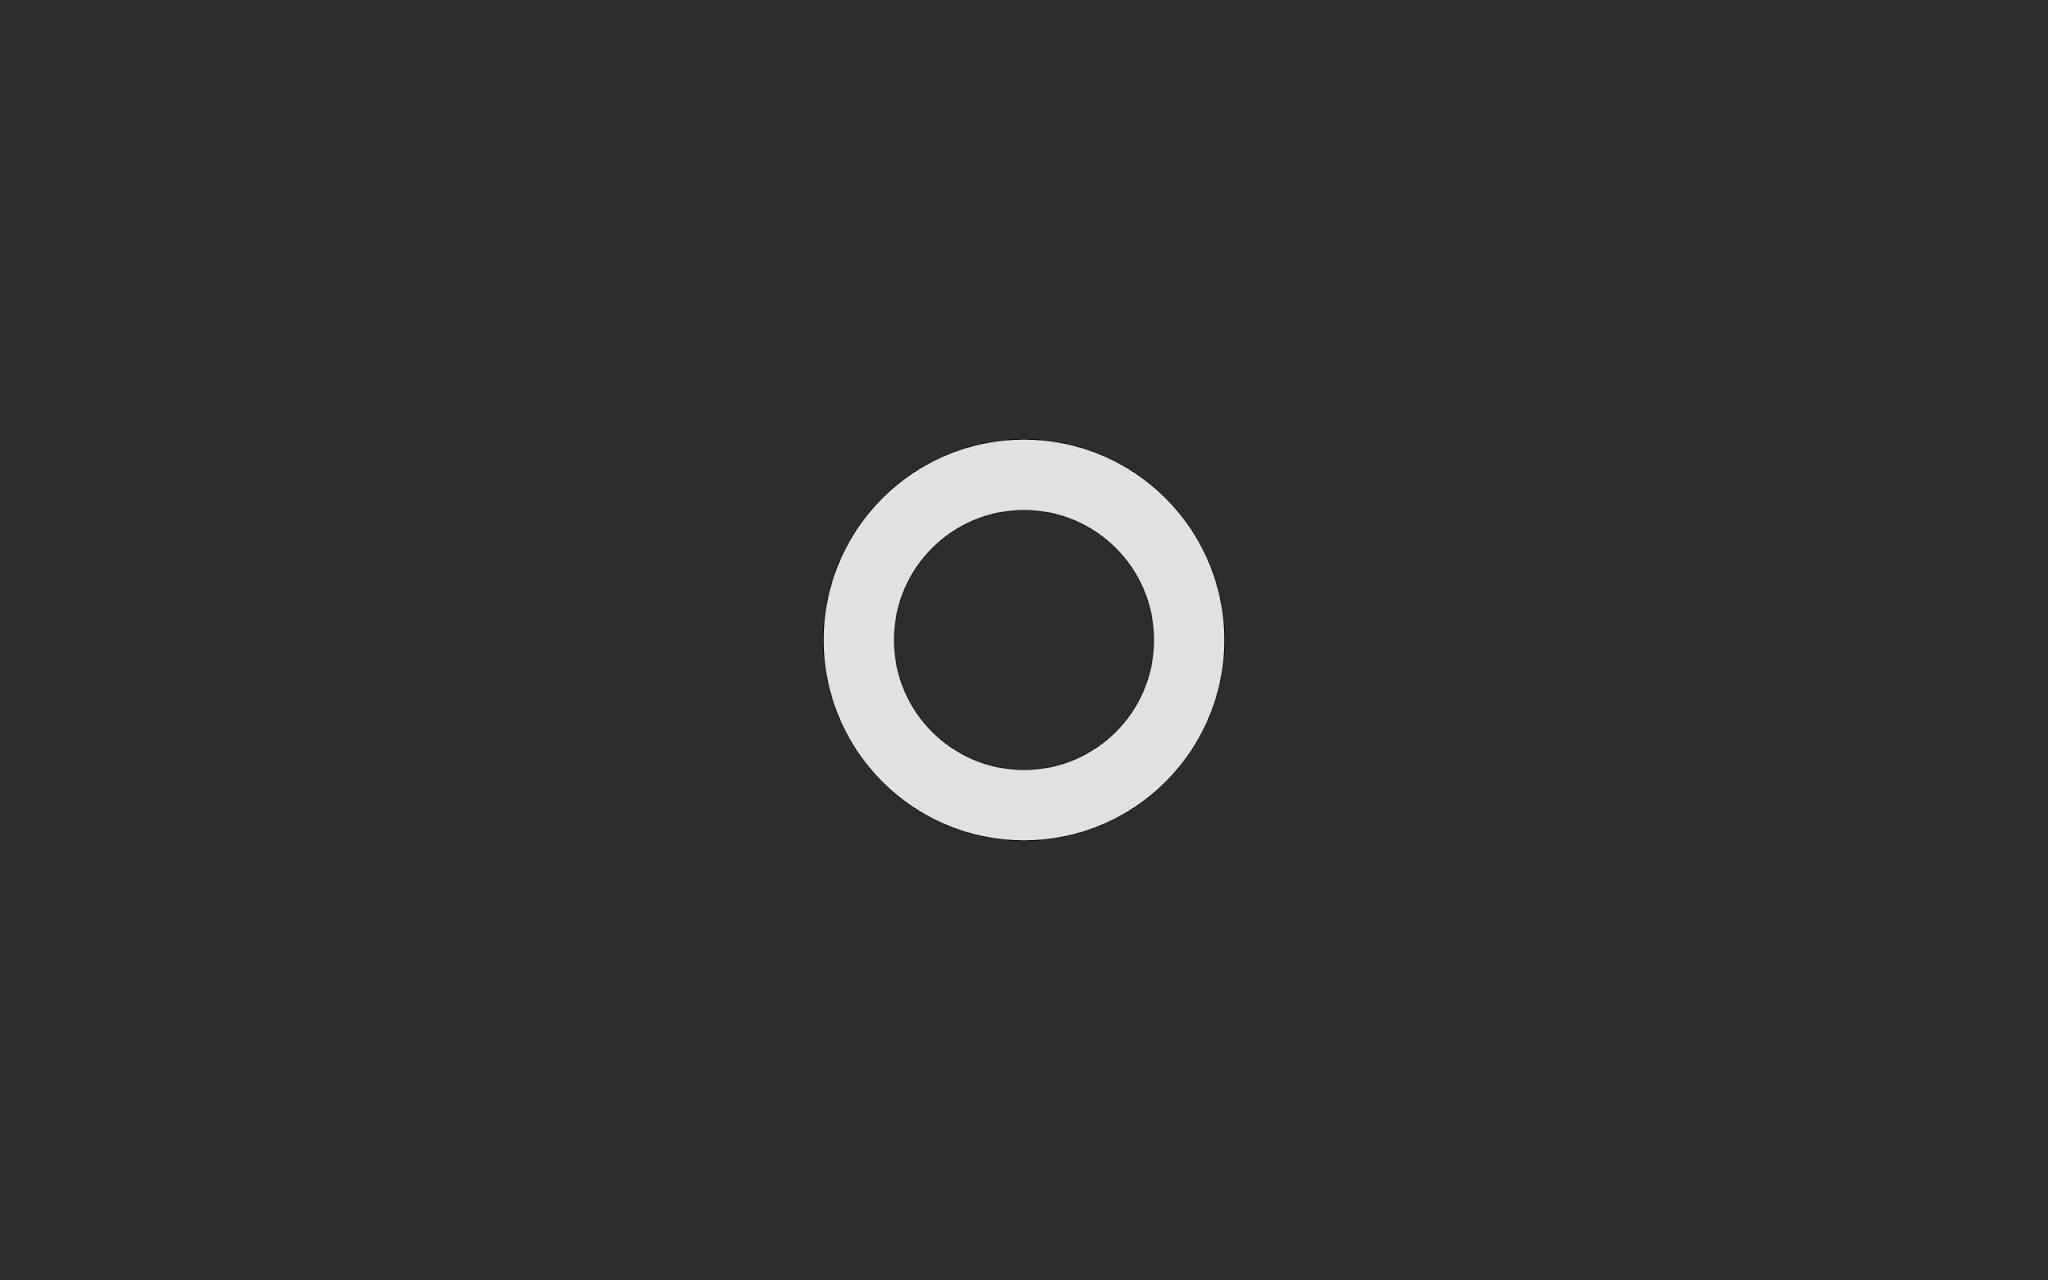 minimalism 1182k followers, 3 following, 453 posts - see instagram photos and videos from minimalism (@minimalism.